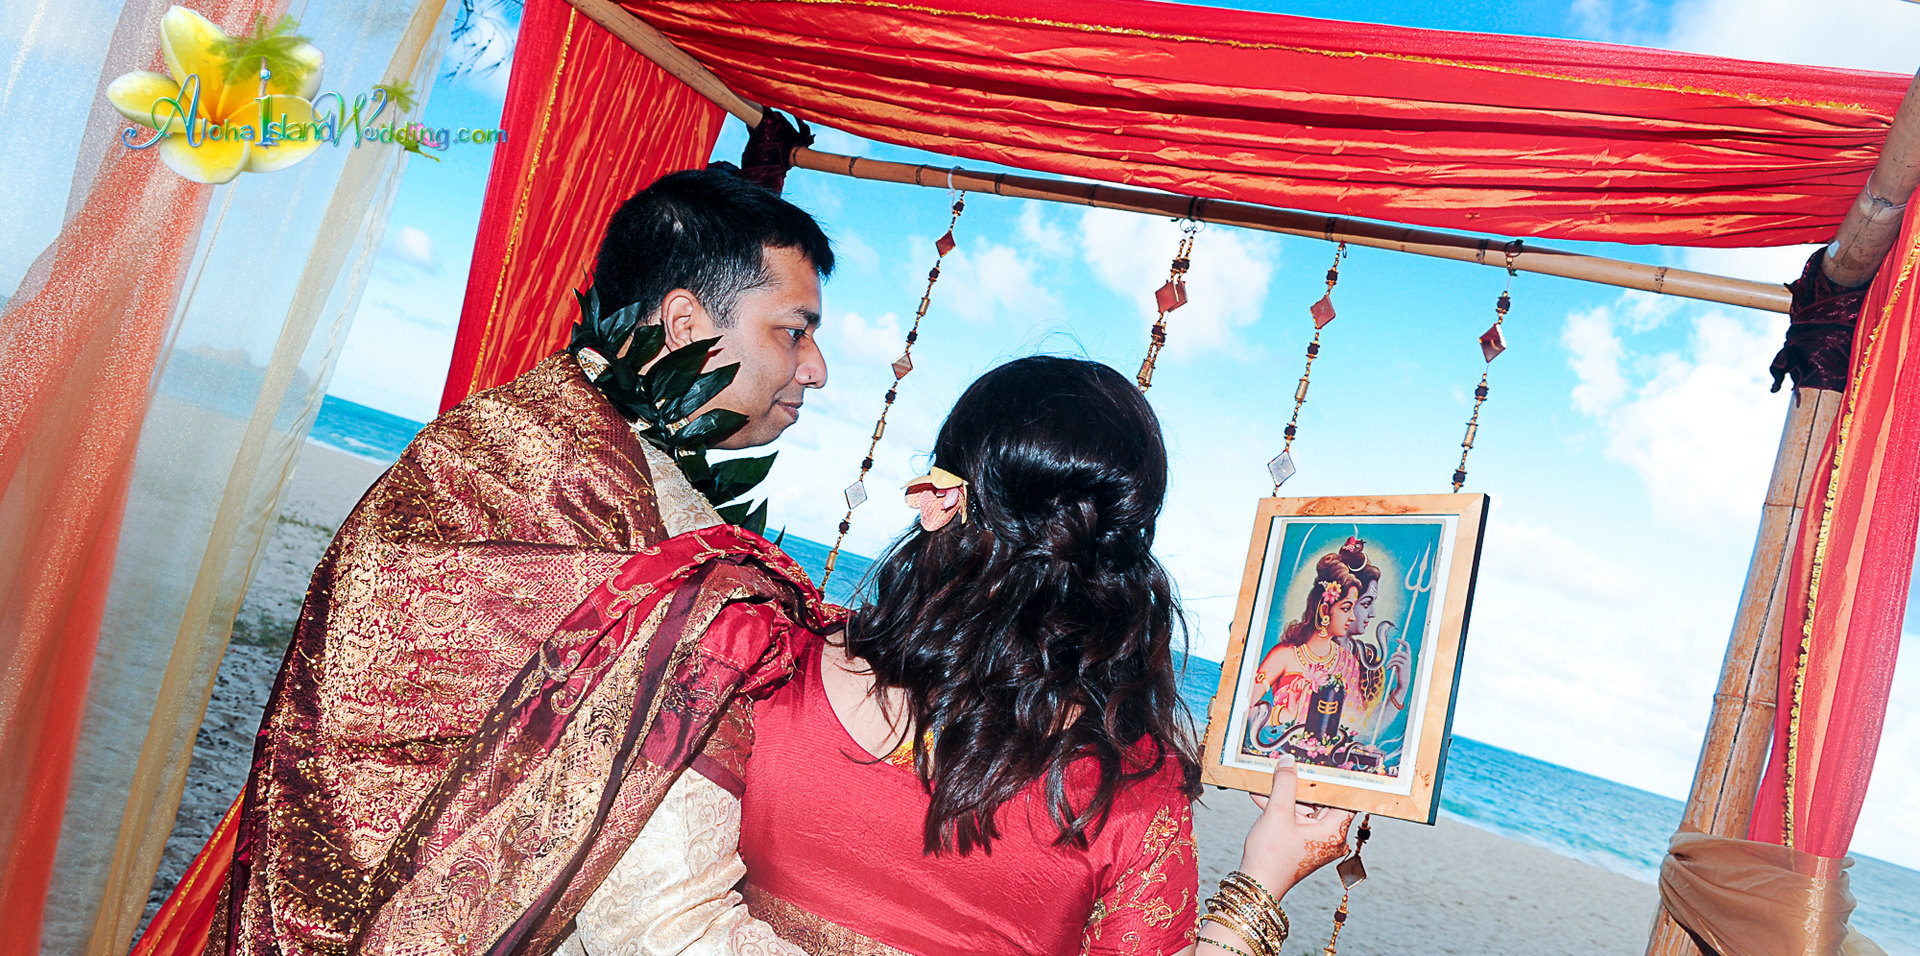 Indian wedding ceremony in hawaii-270.jp